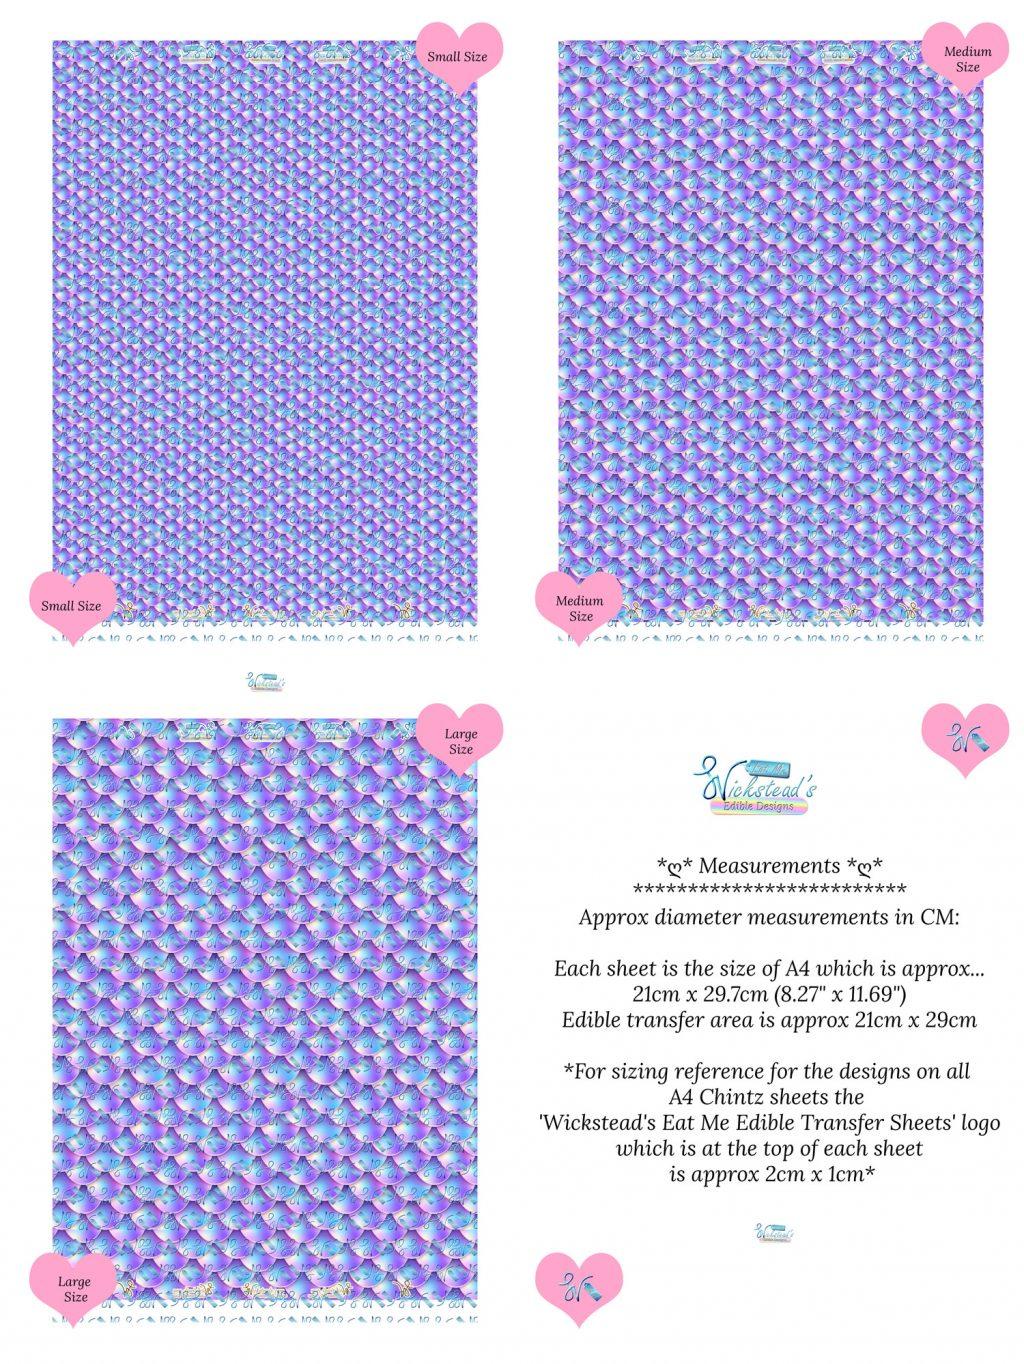 Wickstead's-Eat-Me-Edible-Meringue-Transfer-Sheets–Mermaids-Scales-Purple-(1)